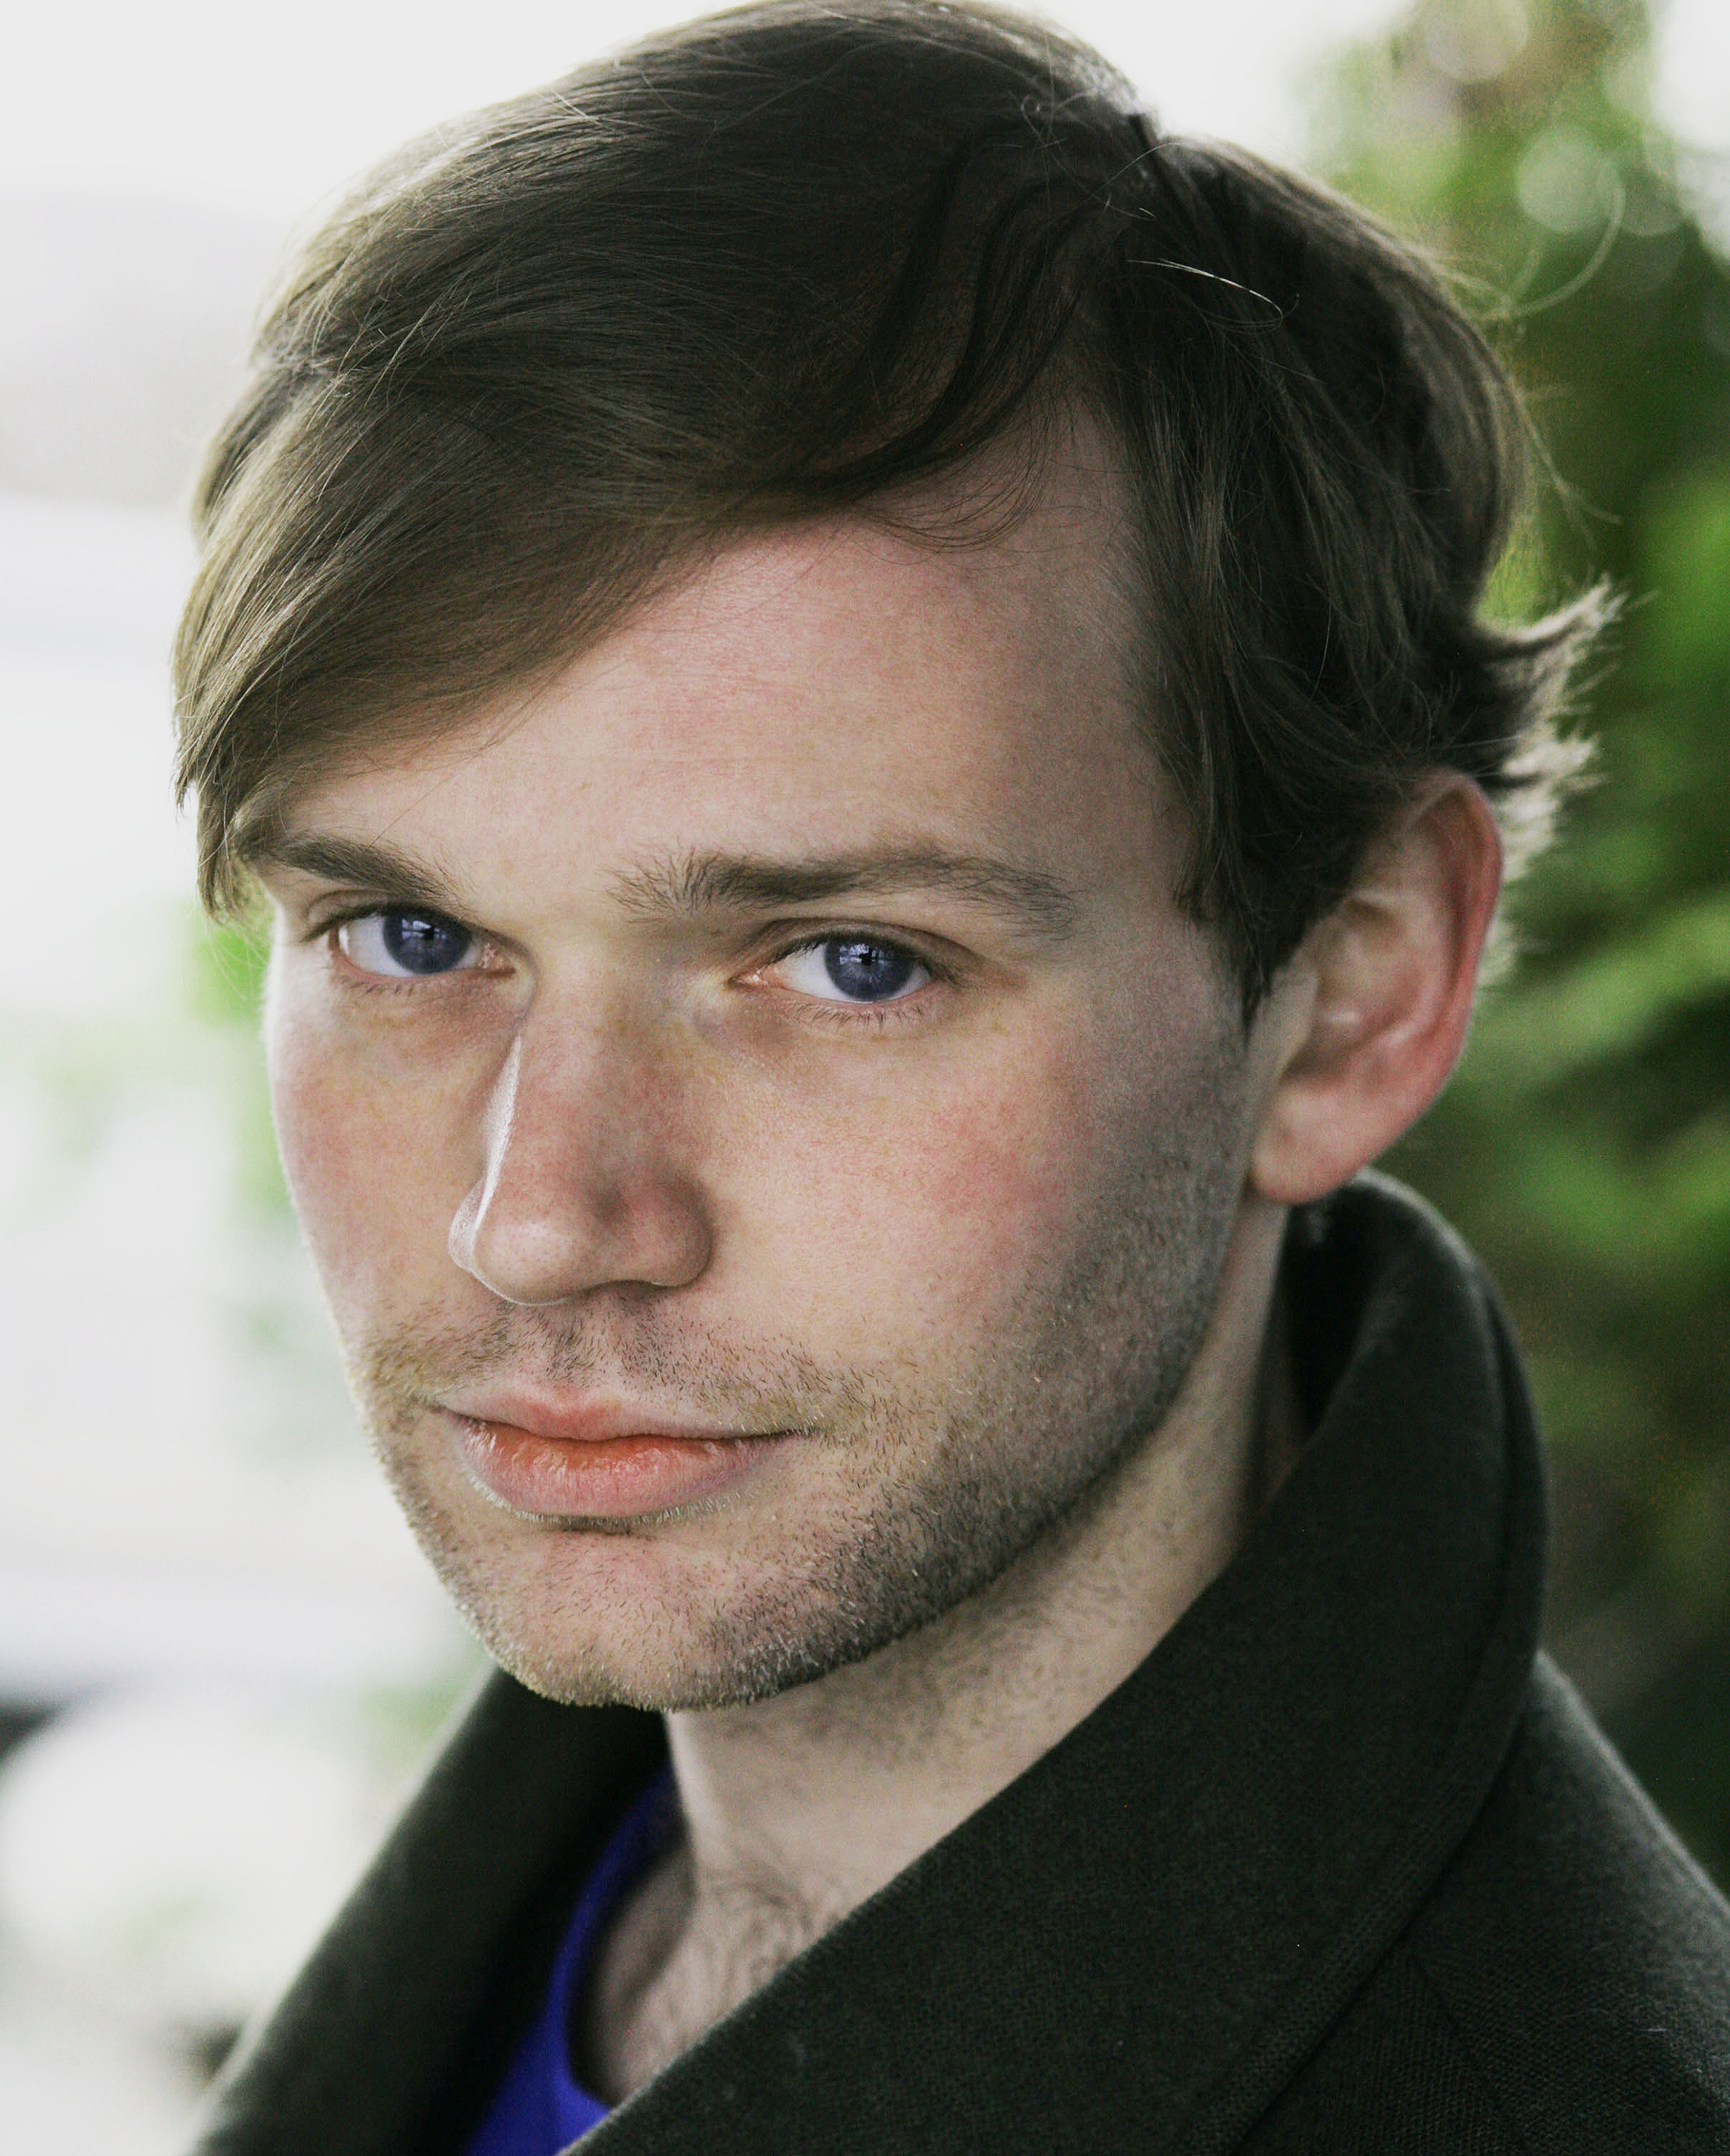 Edmund Digby-Jones